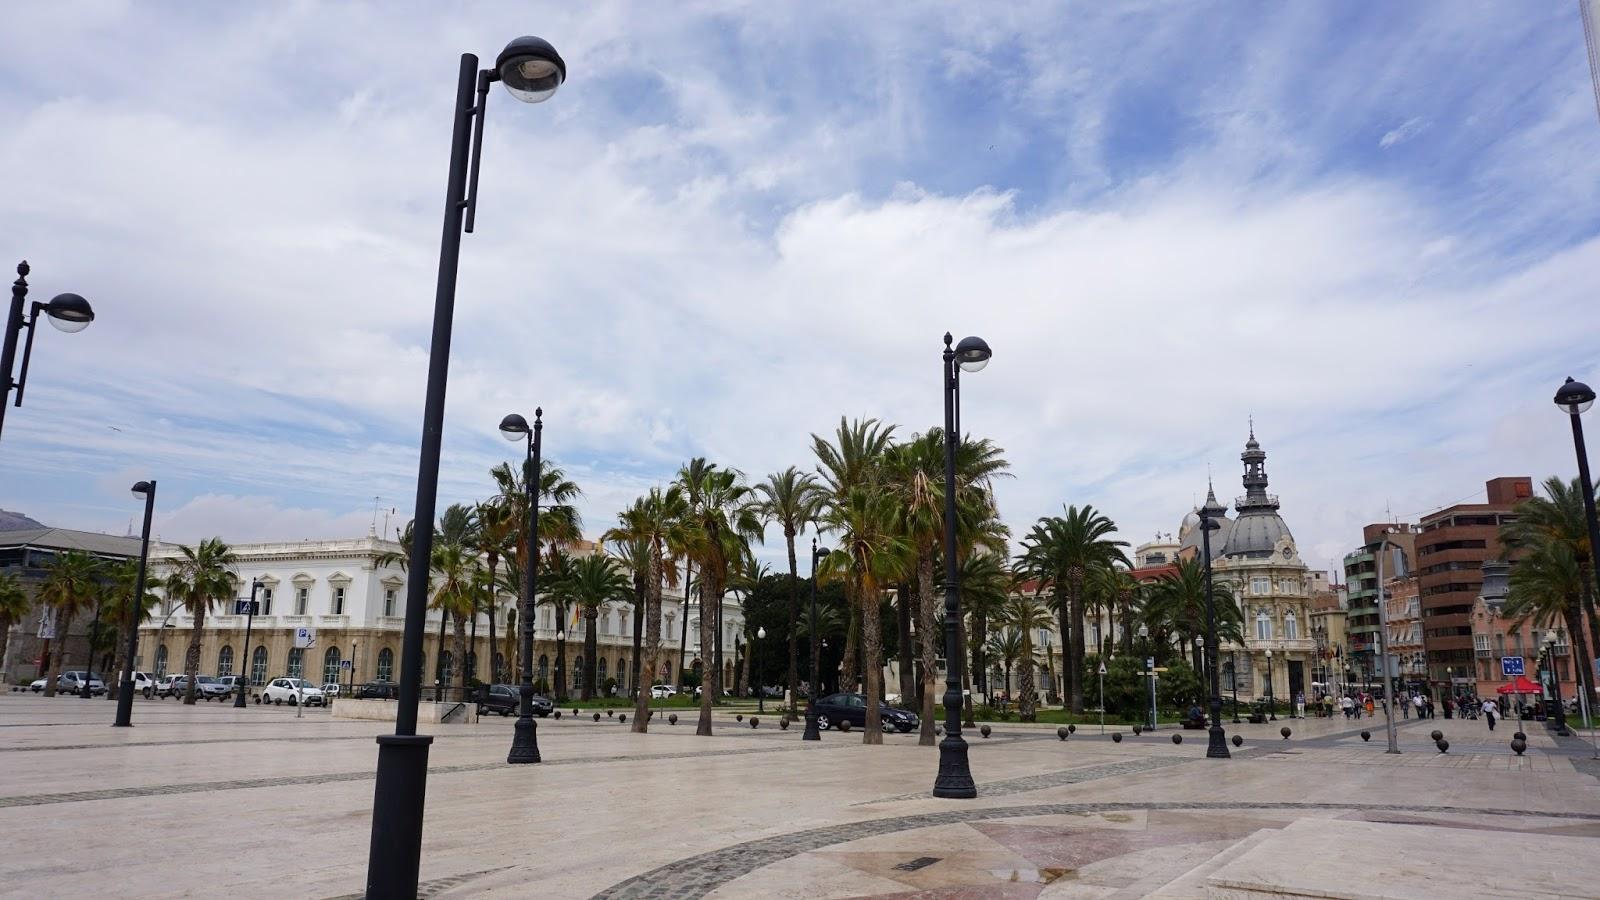 Plaza de los Héroes de Cavite, atrakcje Hiszpanii, hiszpańskie miasta, Pani Dorcia, prowincja Murcja,  Costa Calida